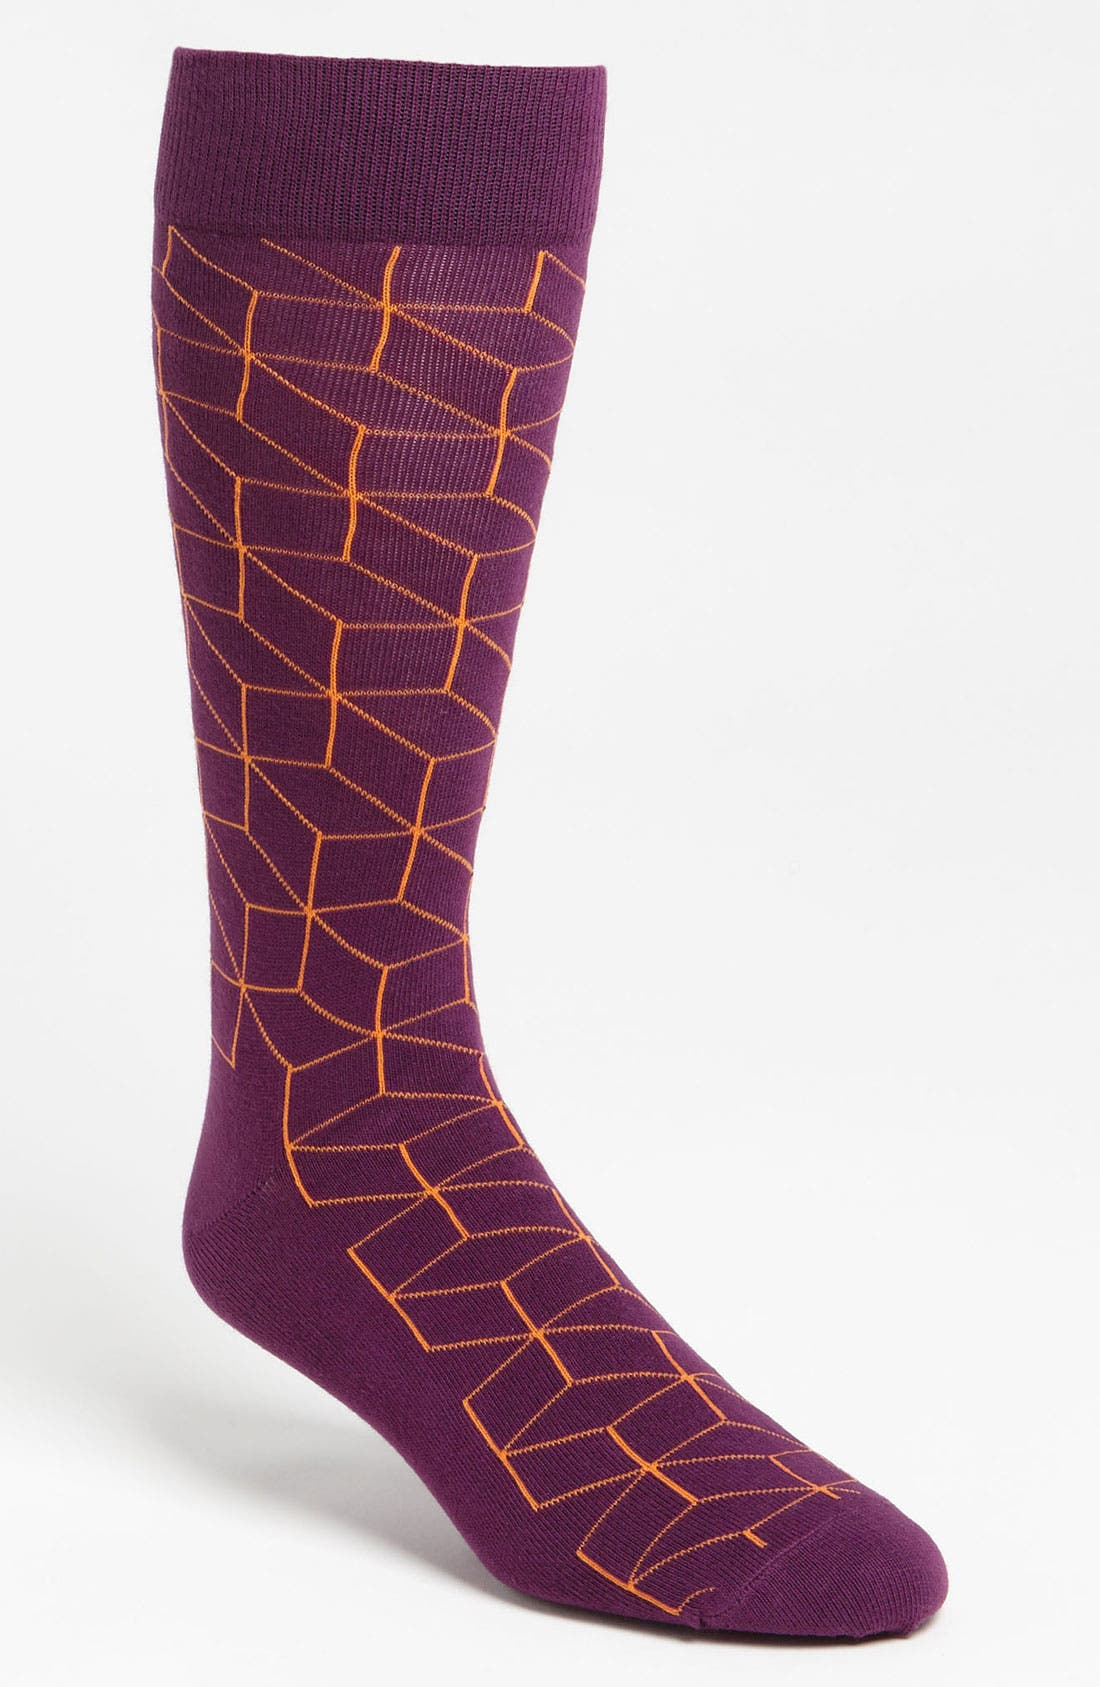 Alternate Image 1 Selected - Happy Socks 'Optic' Socks